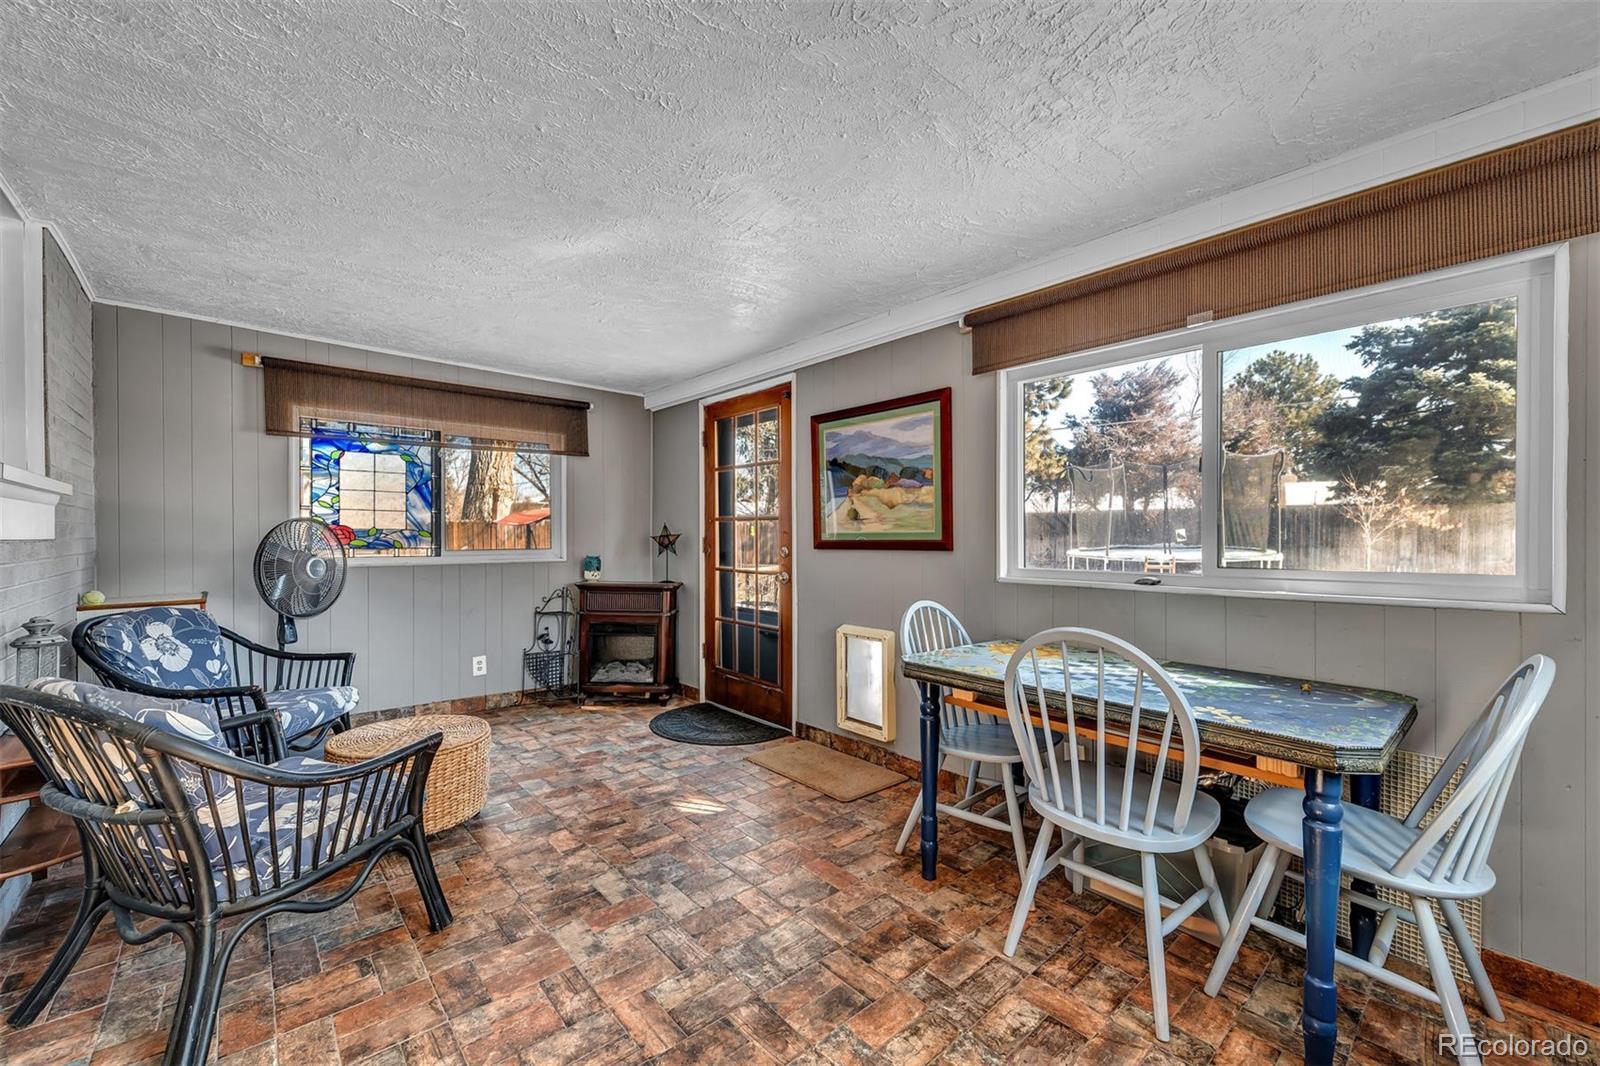 MLS# 2637392 - 16 - 3094 S Gray Street, Lakewood, CO 80227